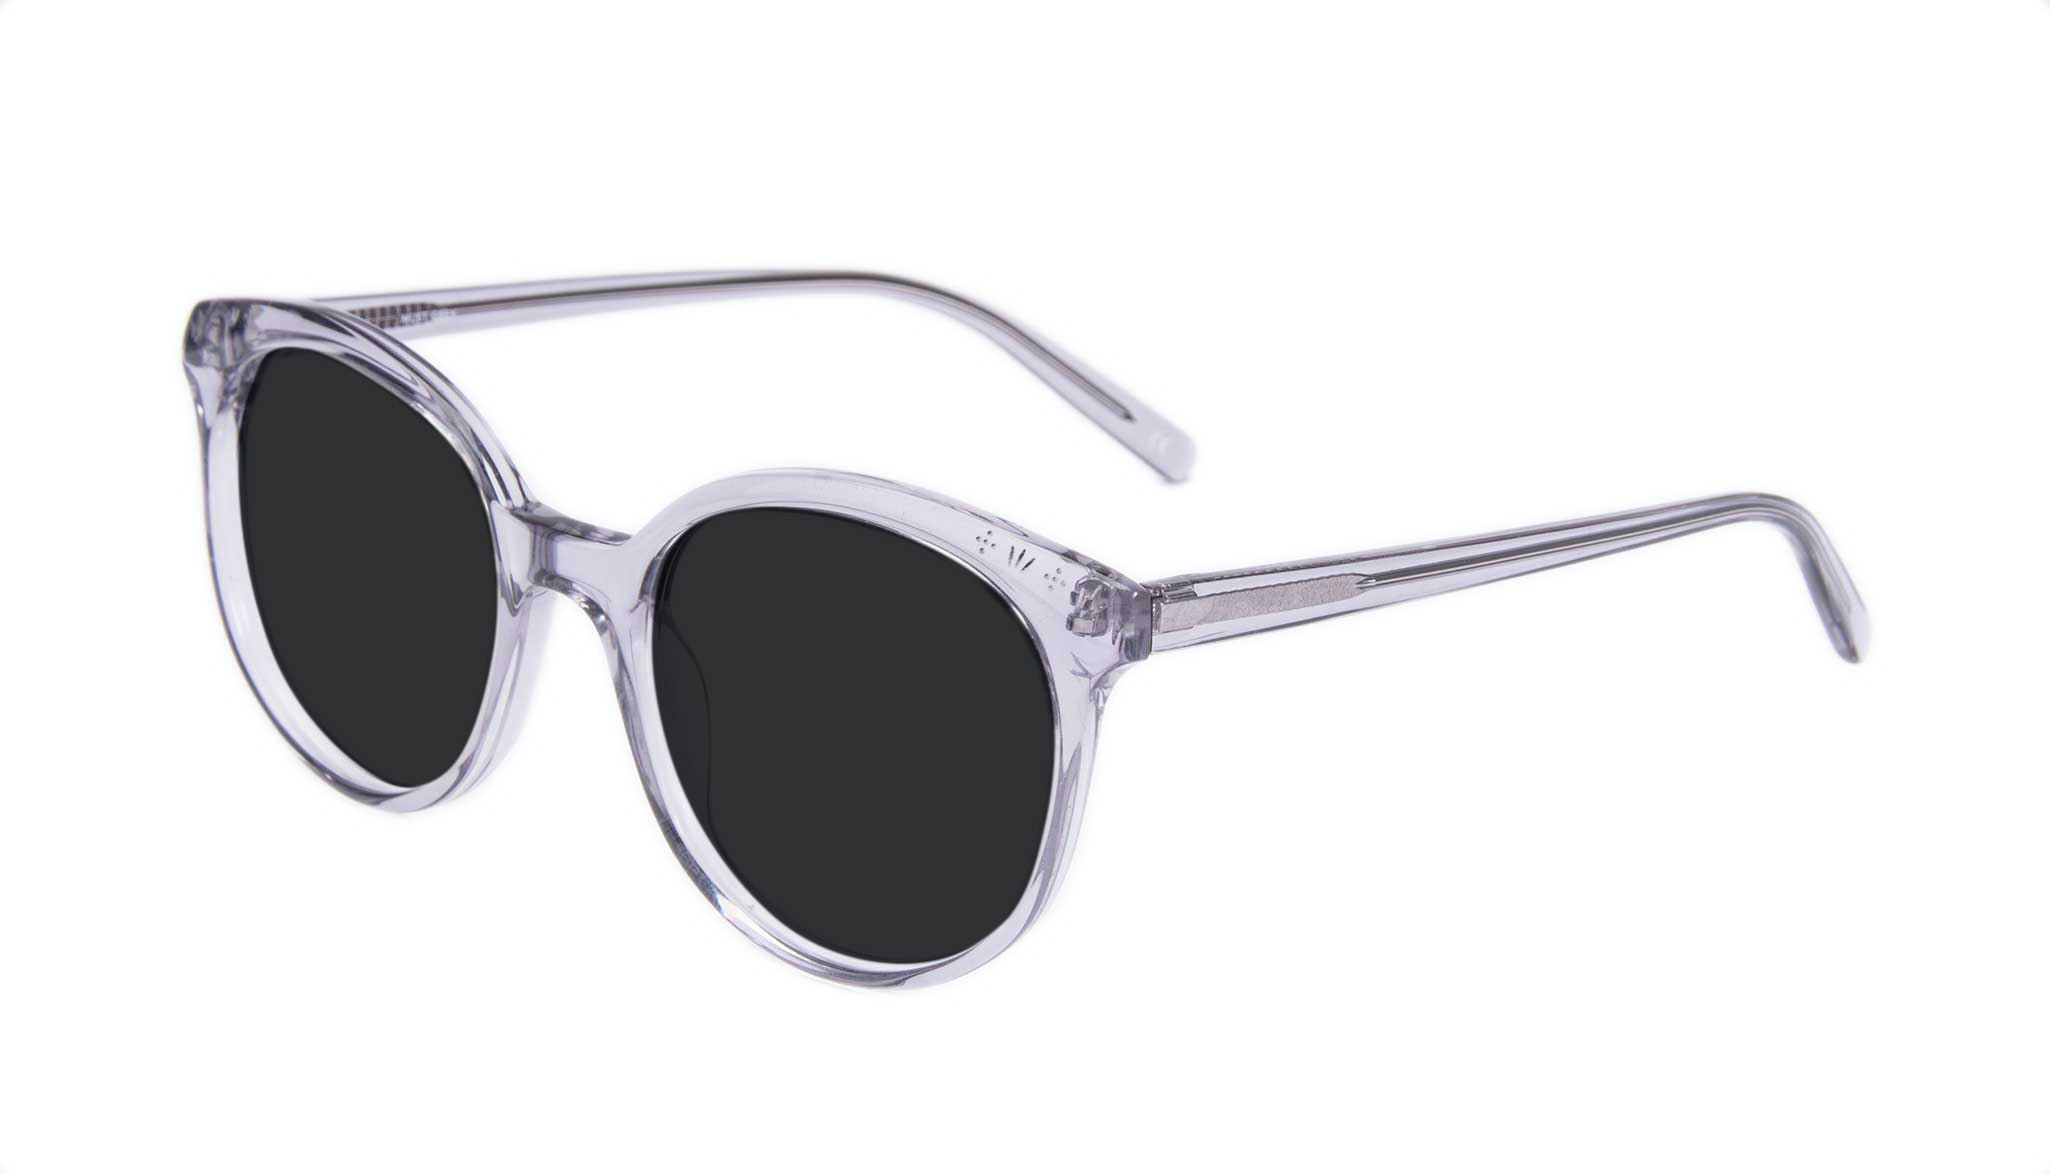 Affordable Fashion Glasses Round Sunglasses Women Must Grey Tilt